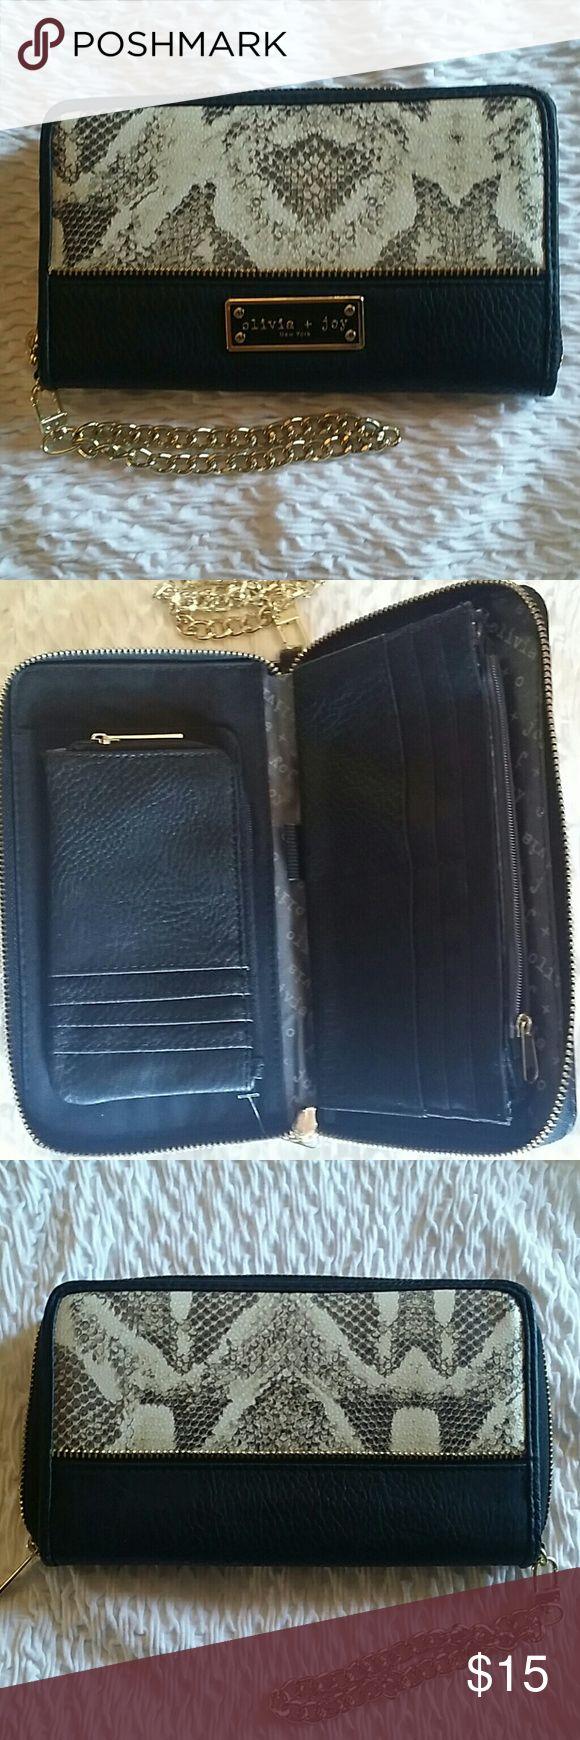 Selling this NEW Wallet by Olivia & Joy New York on Poshmark! My username is: leannbrawley. #shopmycloset #poshmark #fashion #shopping #style #forsale #Olivia & Joy #Handbags